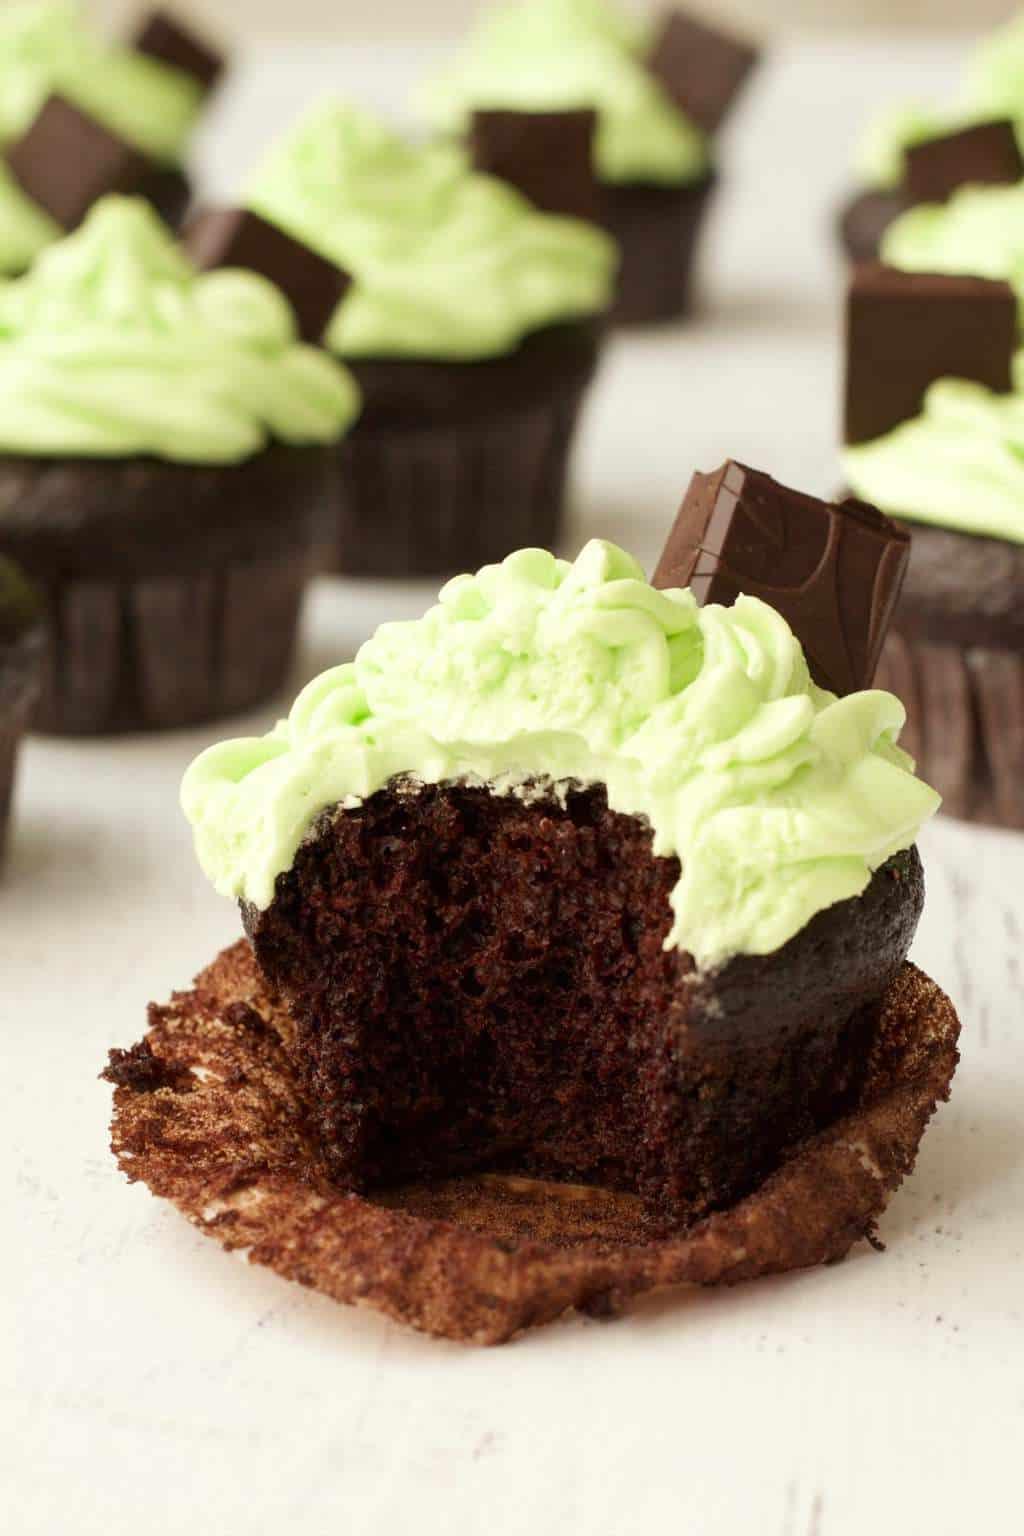 Vegan Chocolate Cupcakes with Mint Buttercream Frosting #vegan #lovingitvegan #dessert #cupcakes